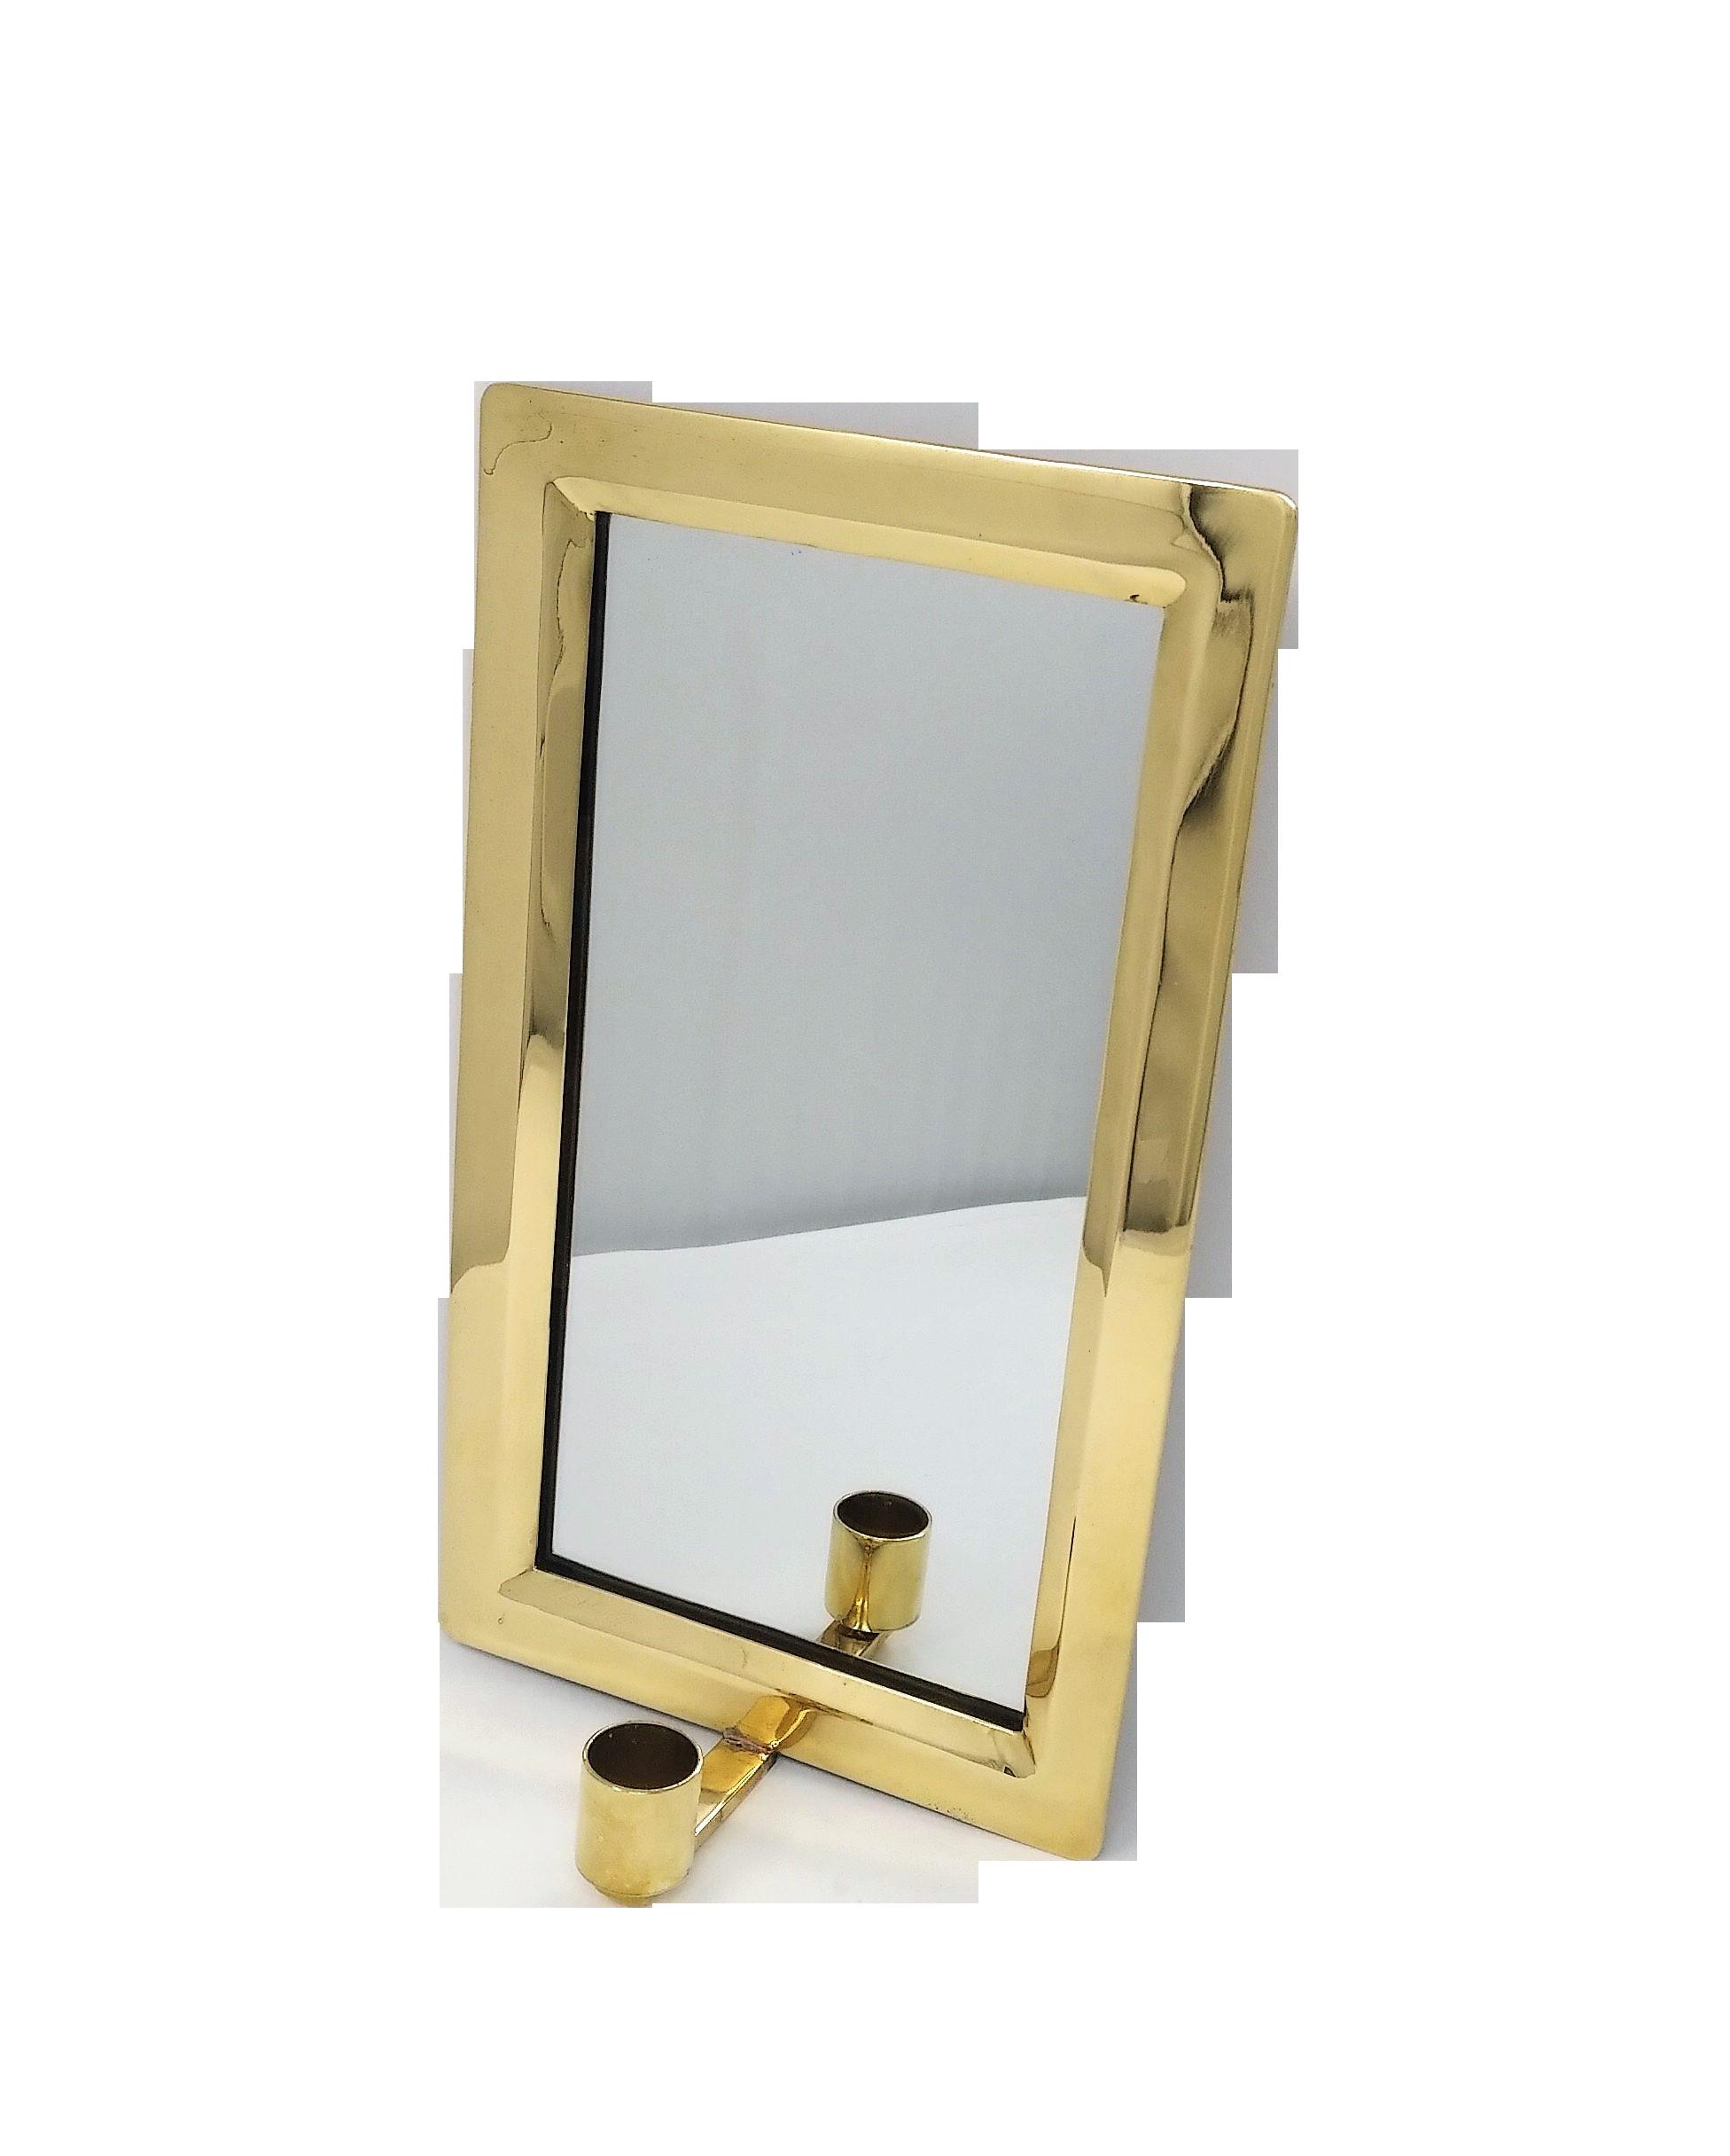 Mässing - Spegellampett 18*30 cm Image